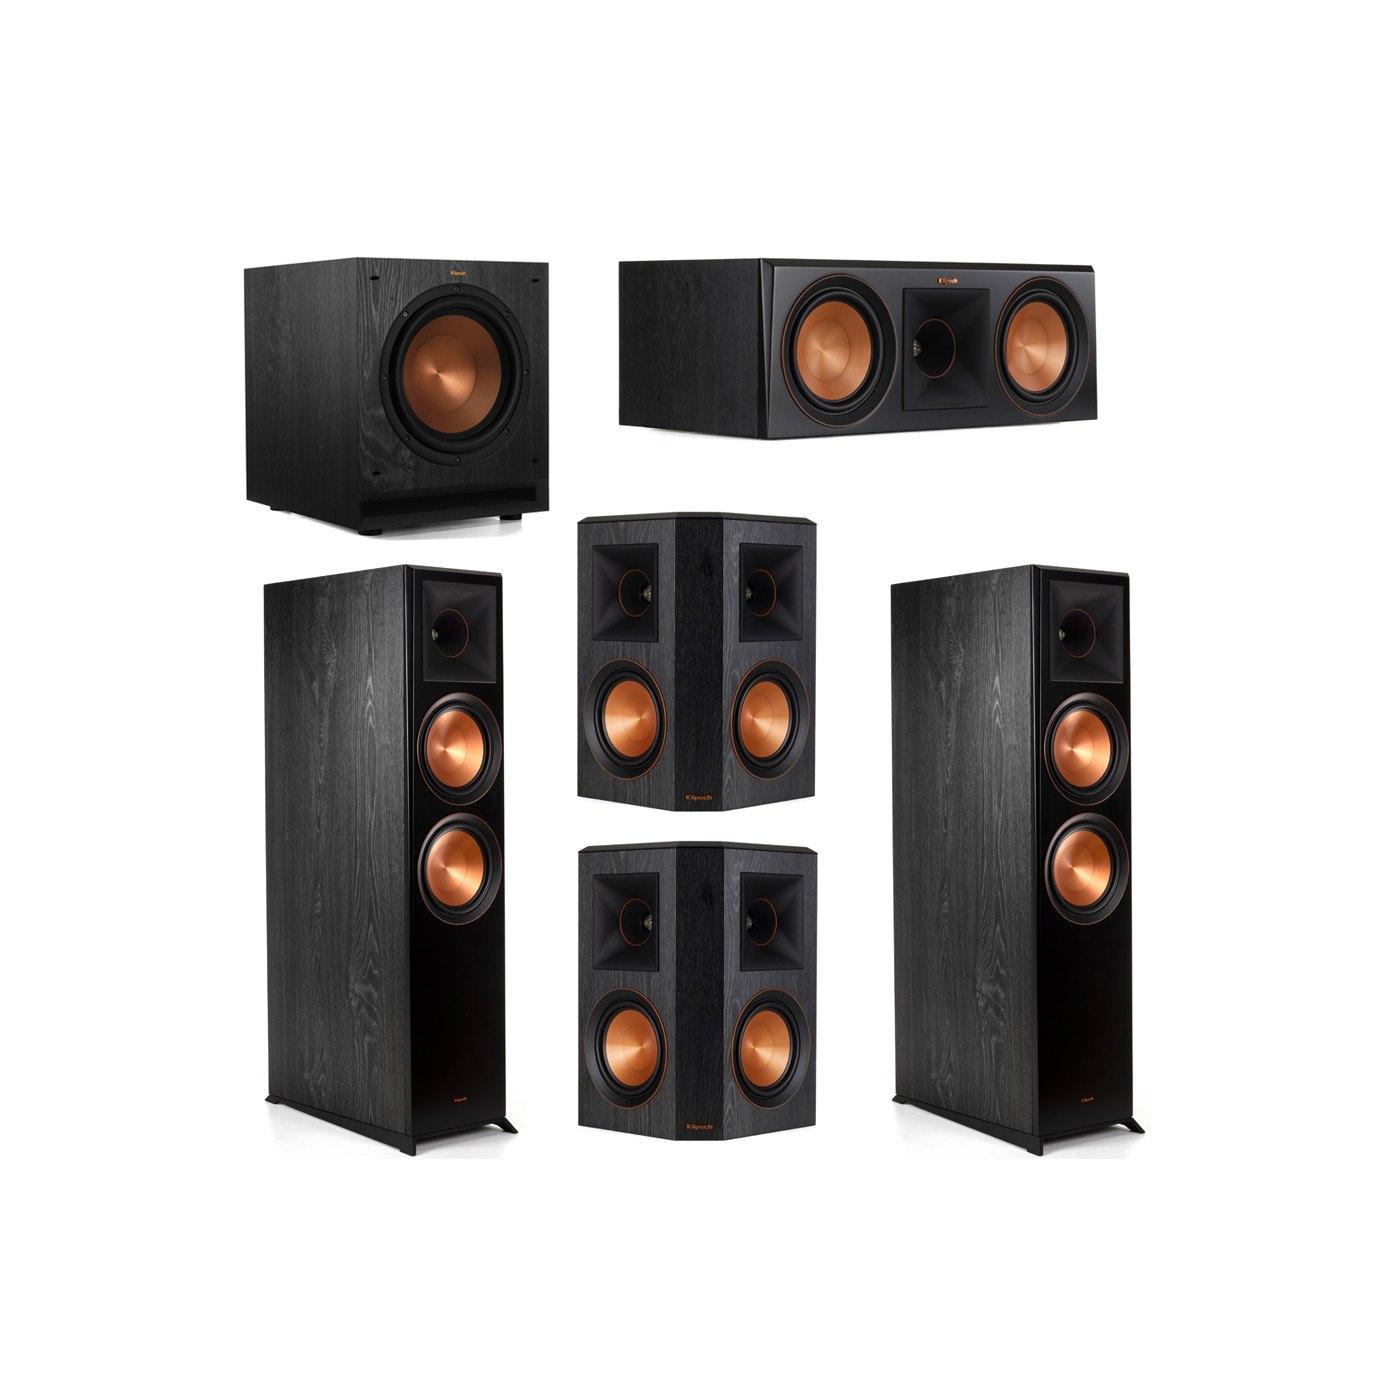 Klipsch 5.1 System with 2 RP-8000F Floorstanding Speakers, 1 Klipsch RP-600C Center Speaker, 2 Klipsch RP-502S Surround Speakers, 1 Klipsch SPL-100 Subwoofer